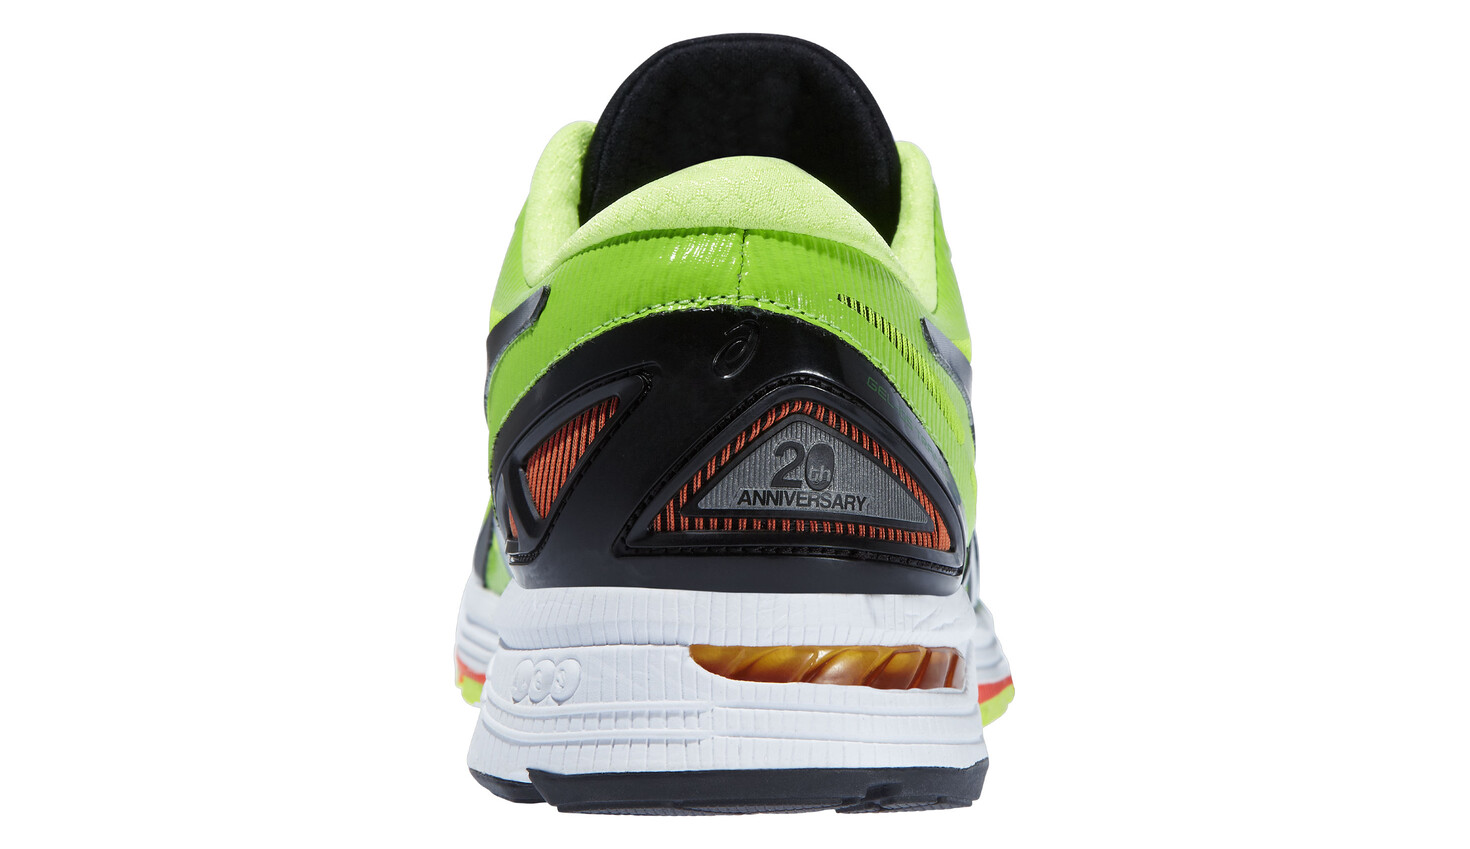 Giày Hiệu  : Lacoste, Timberland, Nike, Adidas, Kappa, Clarks.. - 2